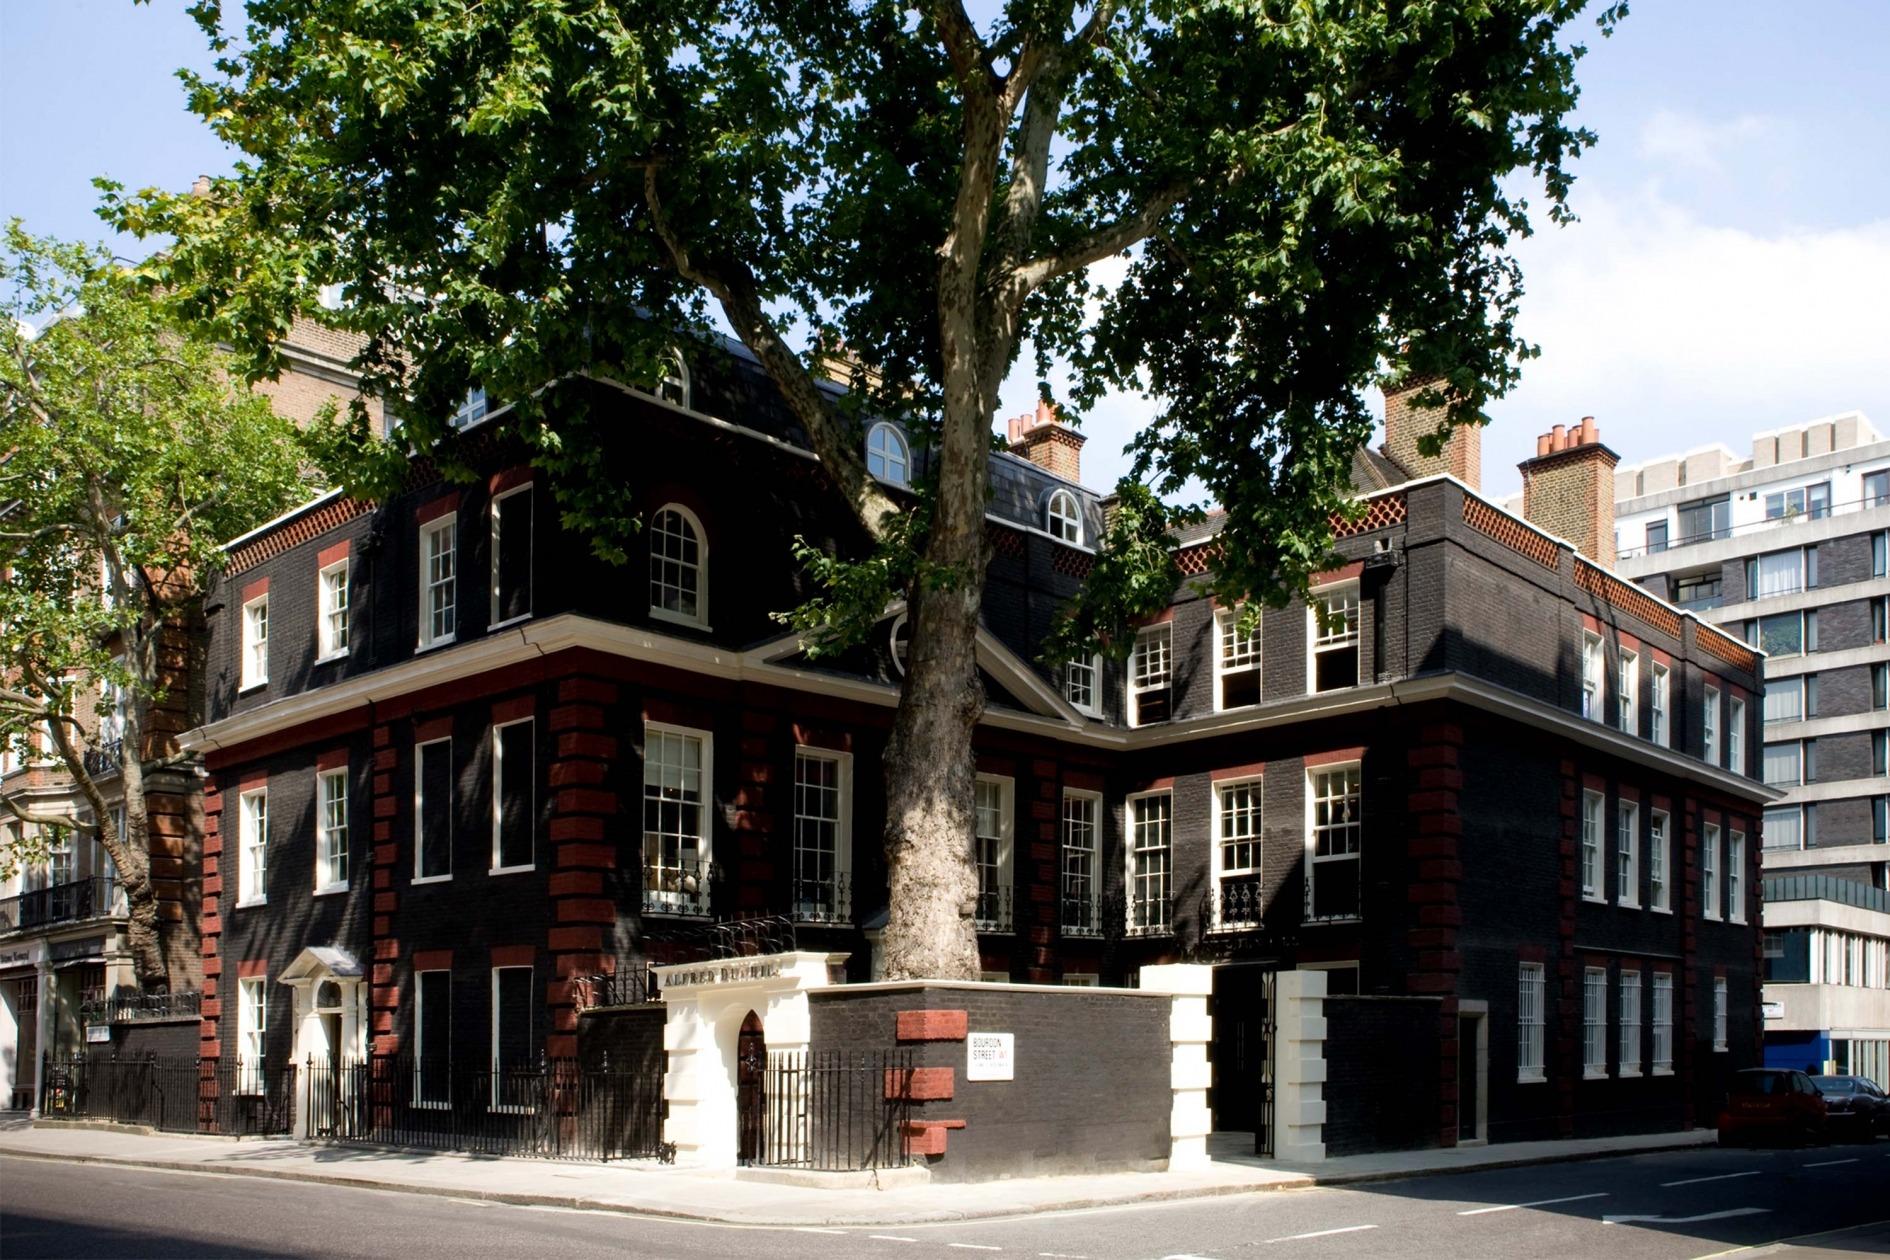 Bourdon-House-exterior-hero-1890x1260.jpg